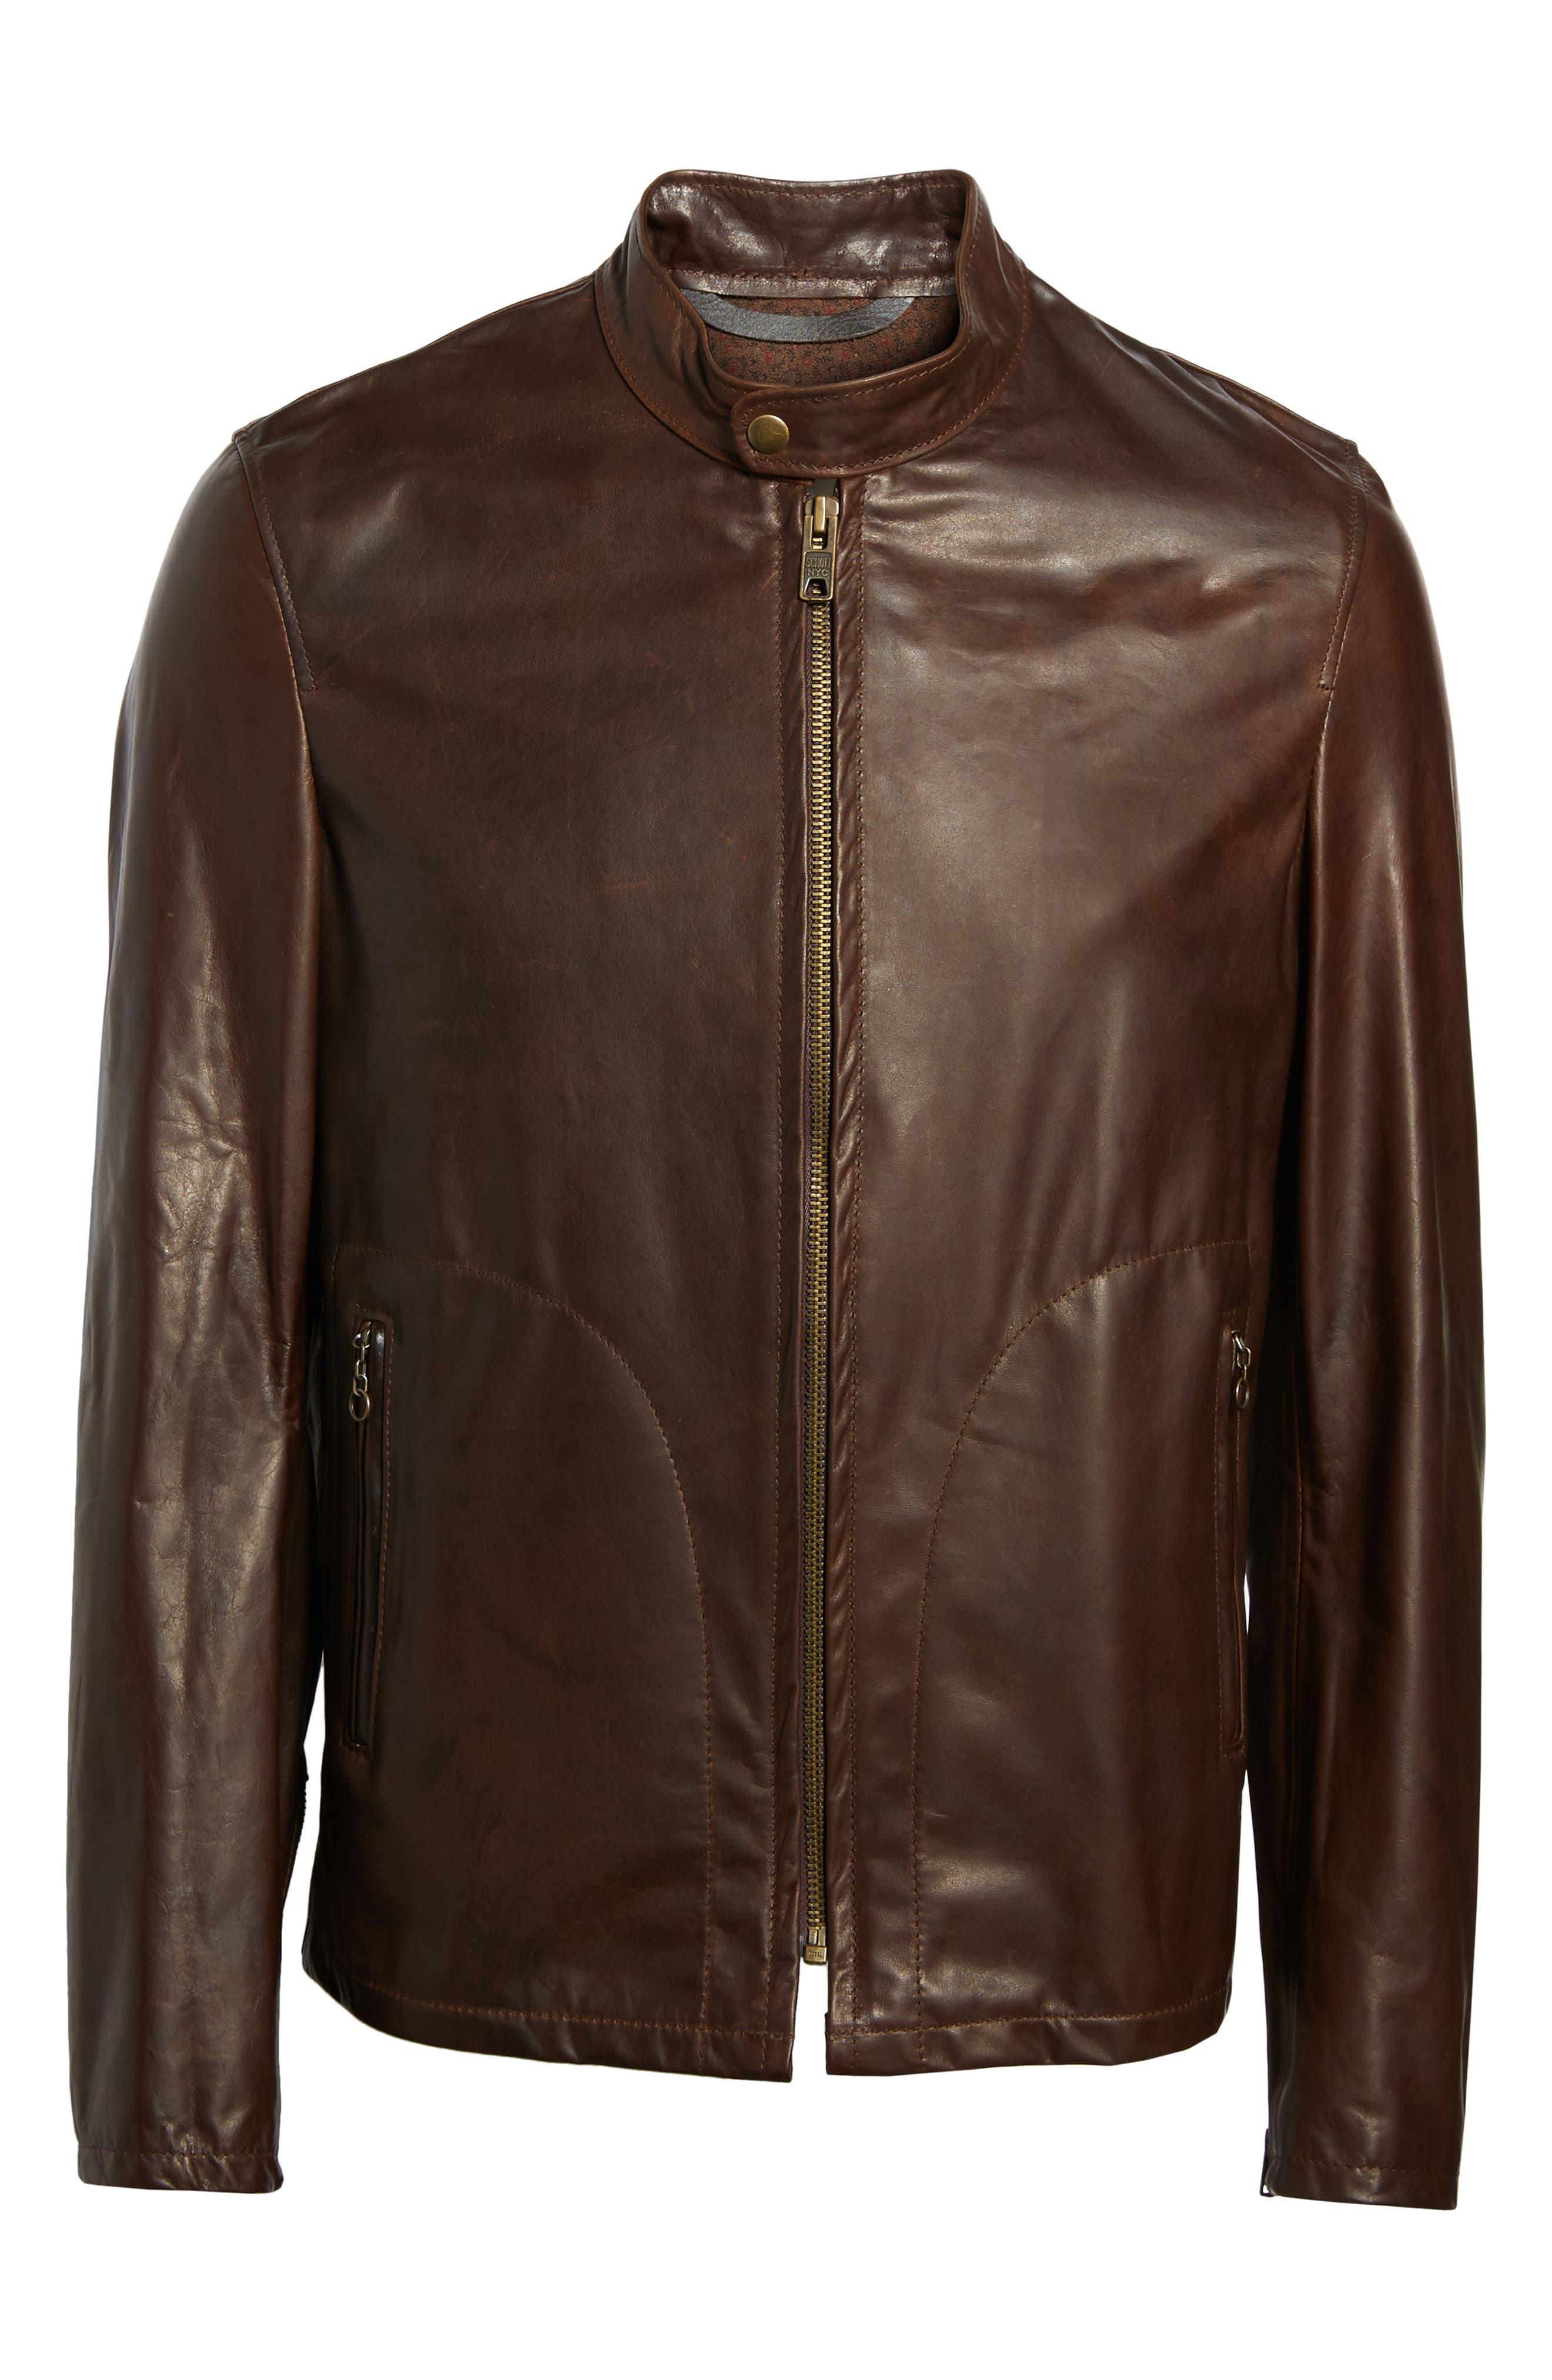 SCHOTT NYC,                             Café Racer Unlined Cowhide Leather Jacket,                             Alternate thumbnail 5, color,                             BROWN